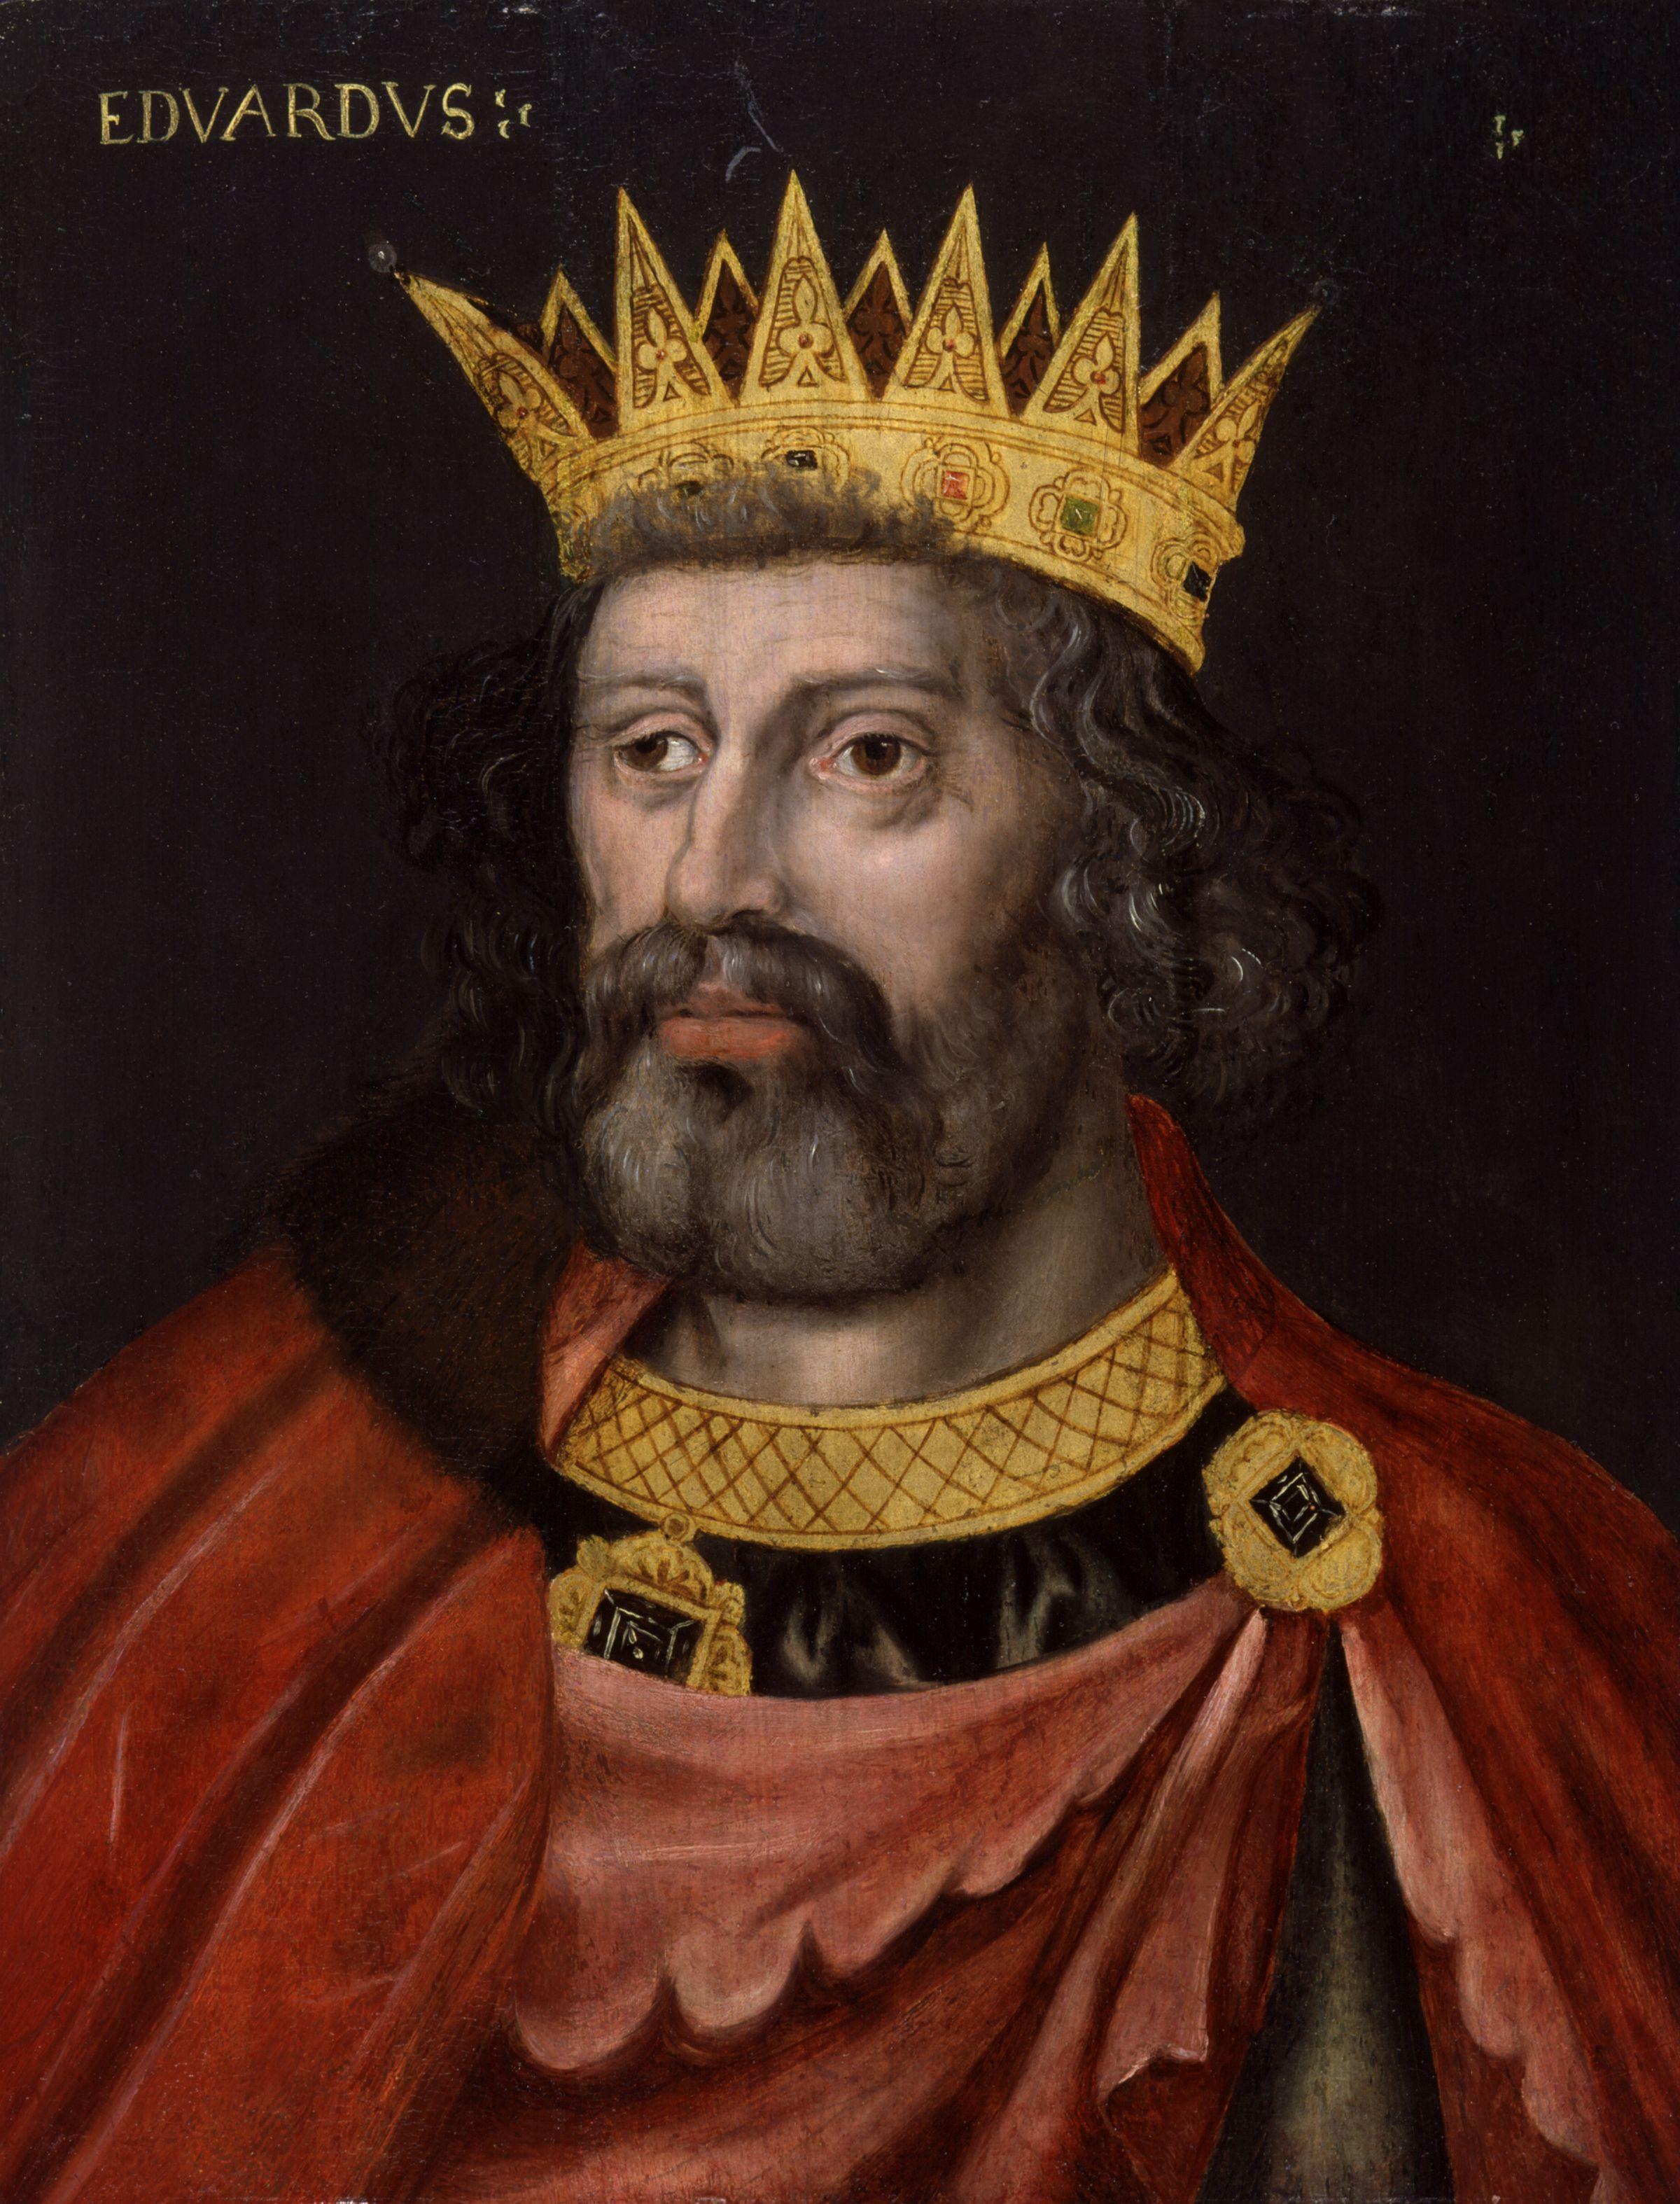 Edward I Kings Henry III England